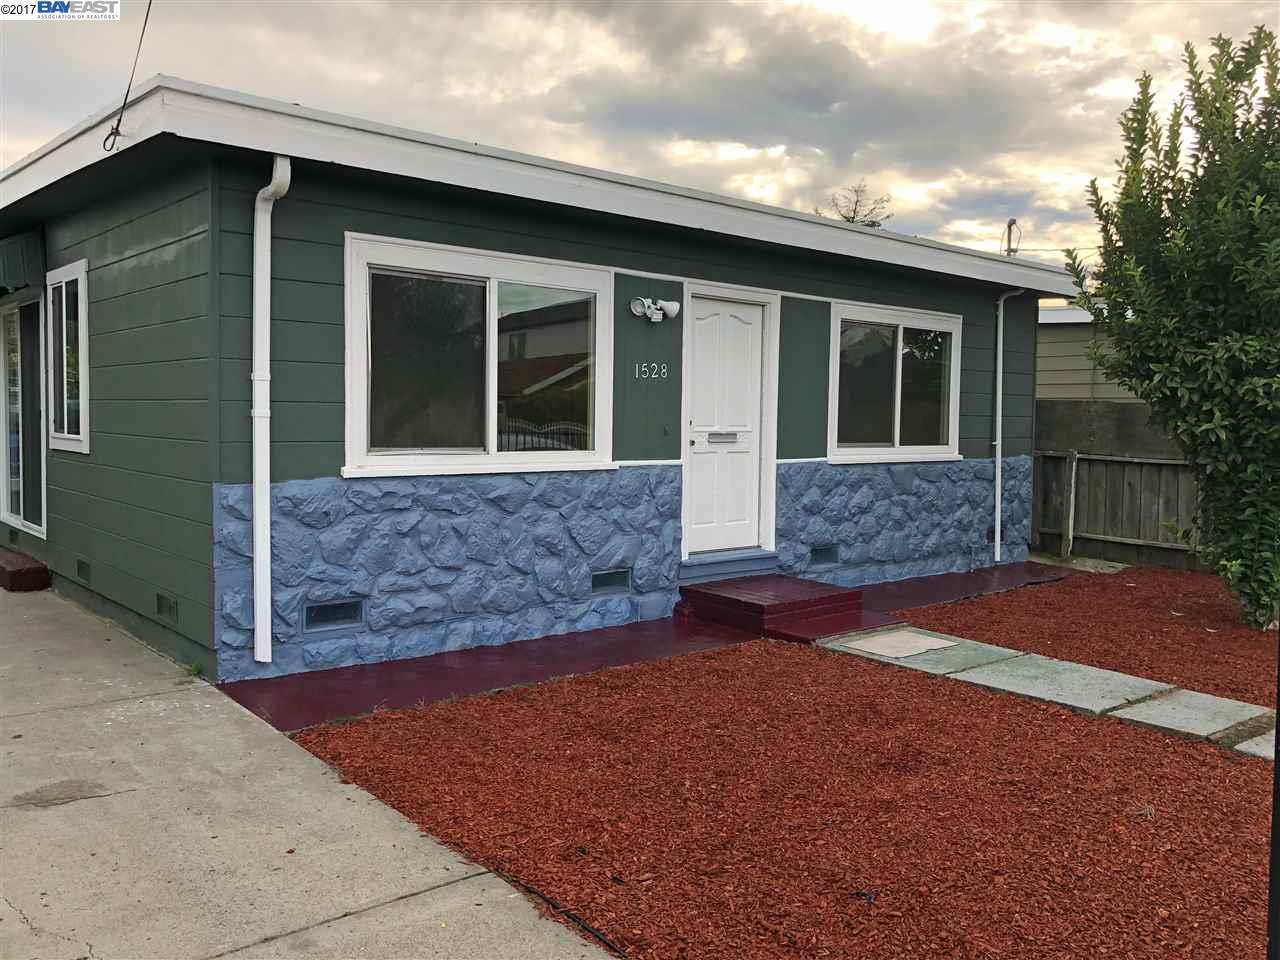 واحد منزل الأسرة للـ Sale في 1528 California Avenue 1528 California Avenue San Pablo, California 94806 United States